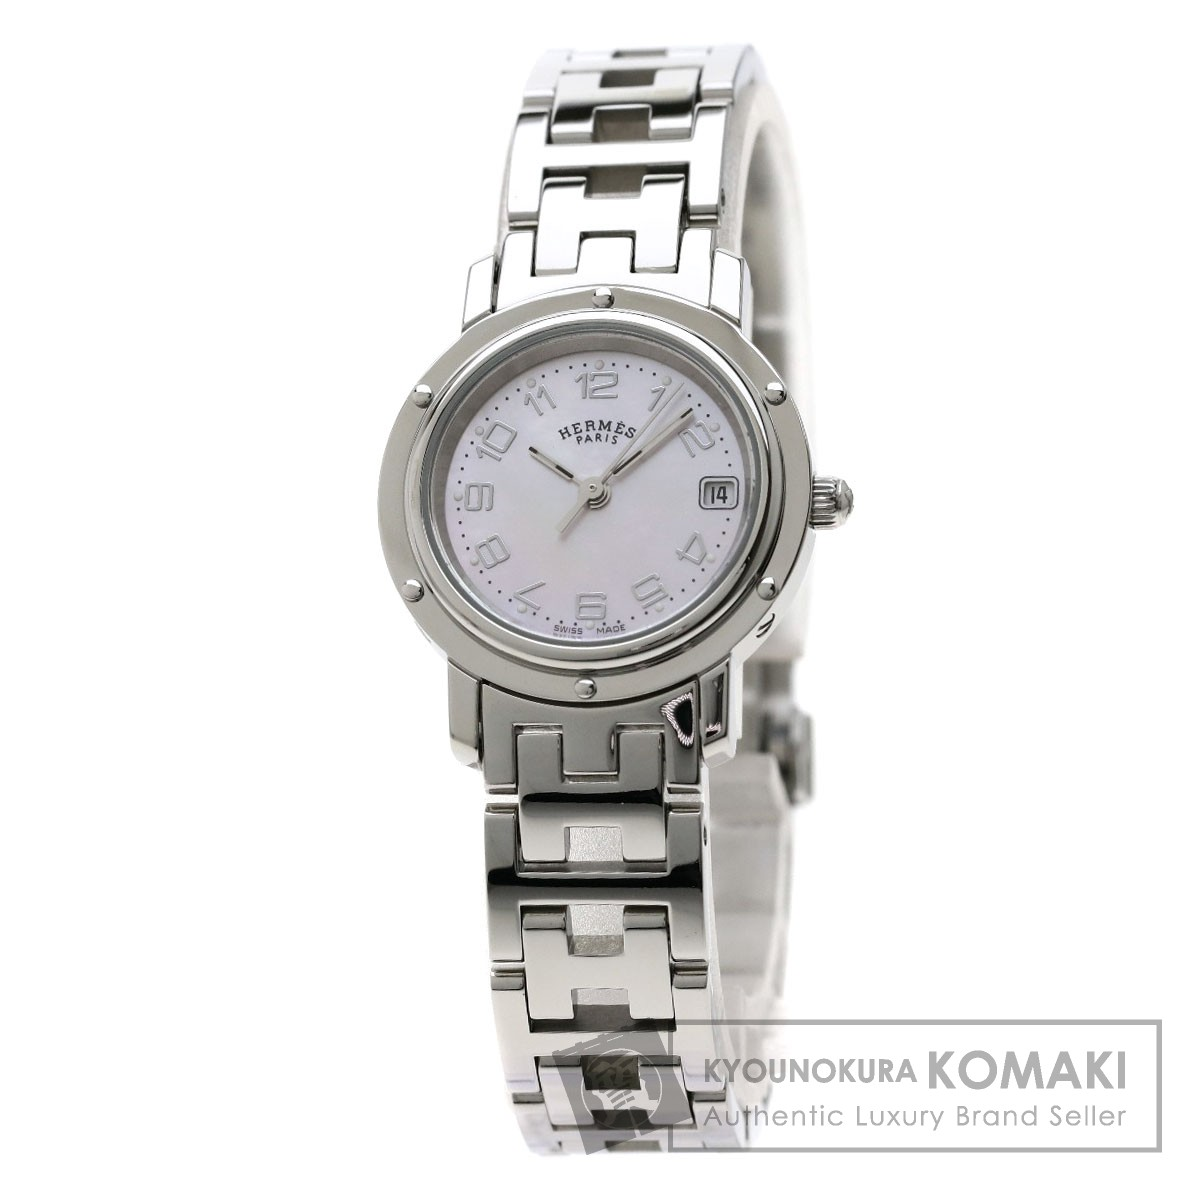 HERMES CL4.210 クリッパーナクレ 腕時計 ステンレススチール/SS レディース 【中古】【エルメス】